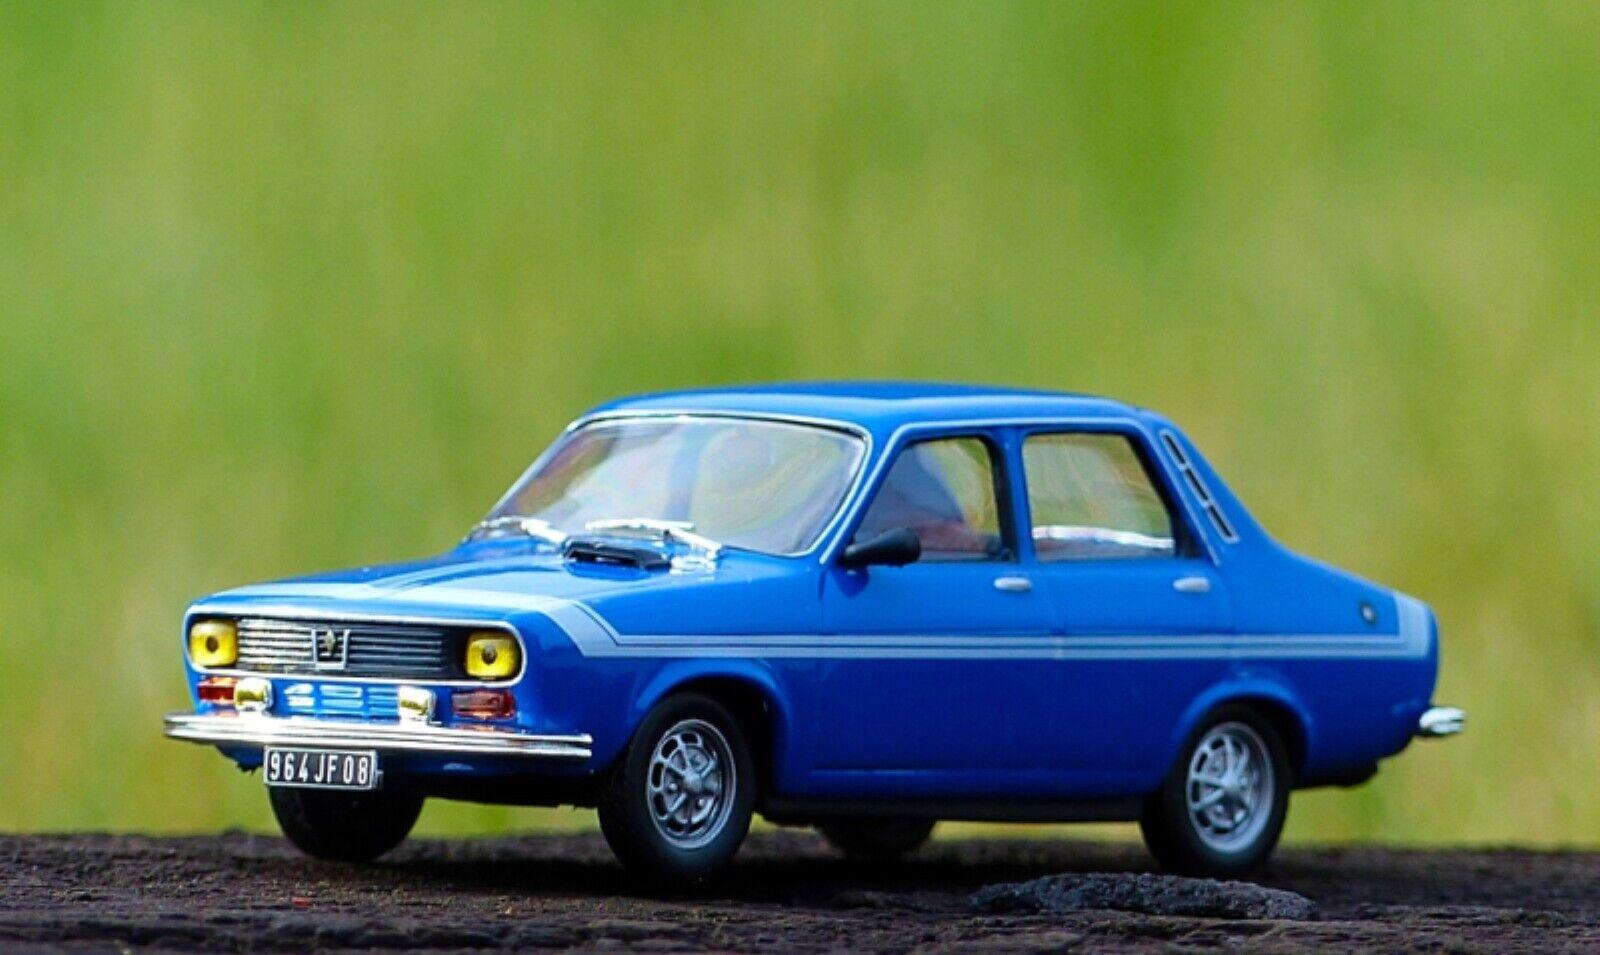 RENAULT 12 GORDINI 1972 1972 1972 1 43 IXO ALTAYA DIE CAST MODELS R12 blue blueE blue 980d36